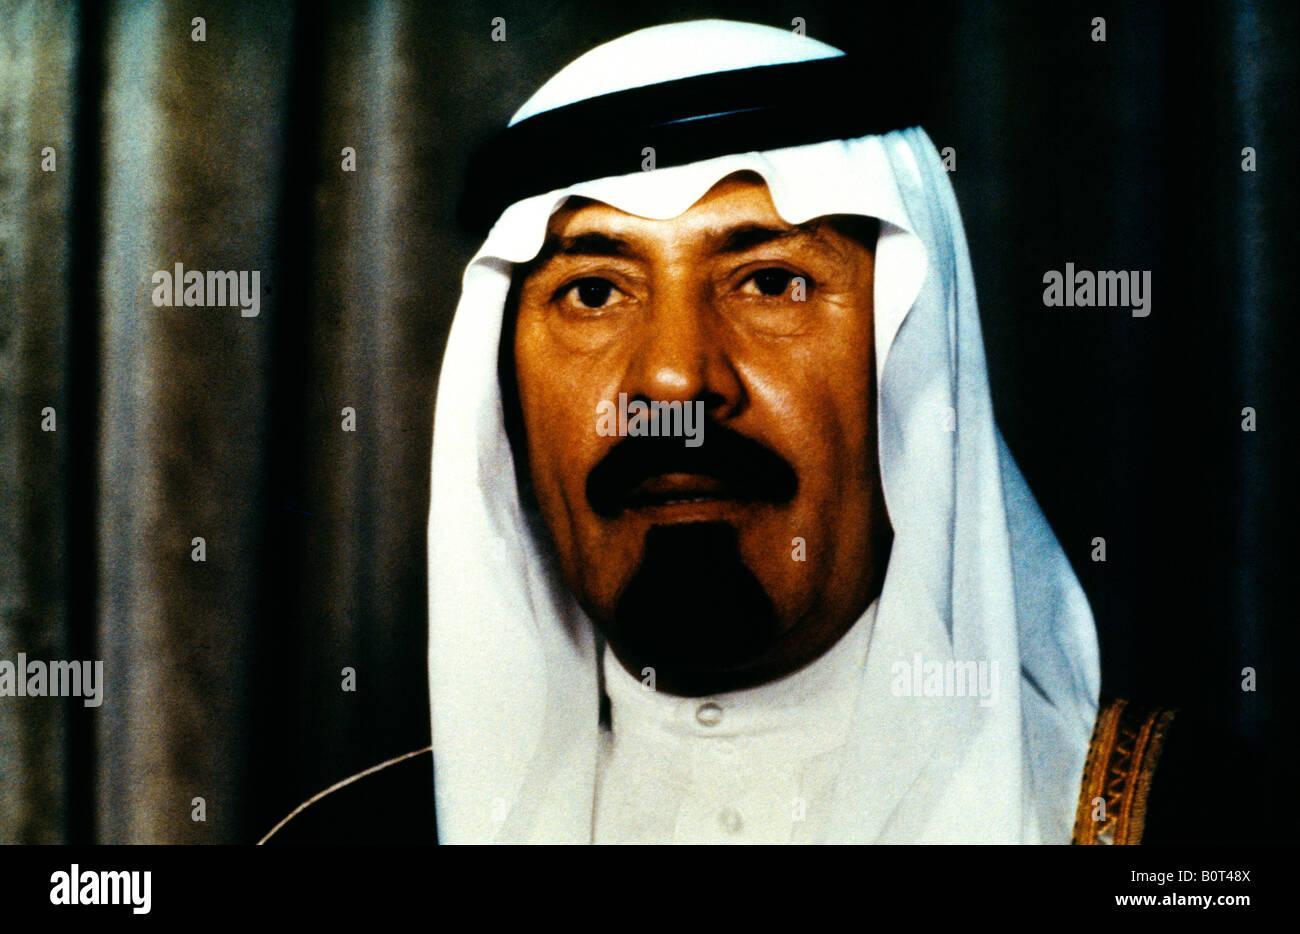 HRH Crown Prince Abdullah Ibn Abdul Aziz Saudi Arabia - Stock Image